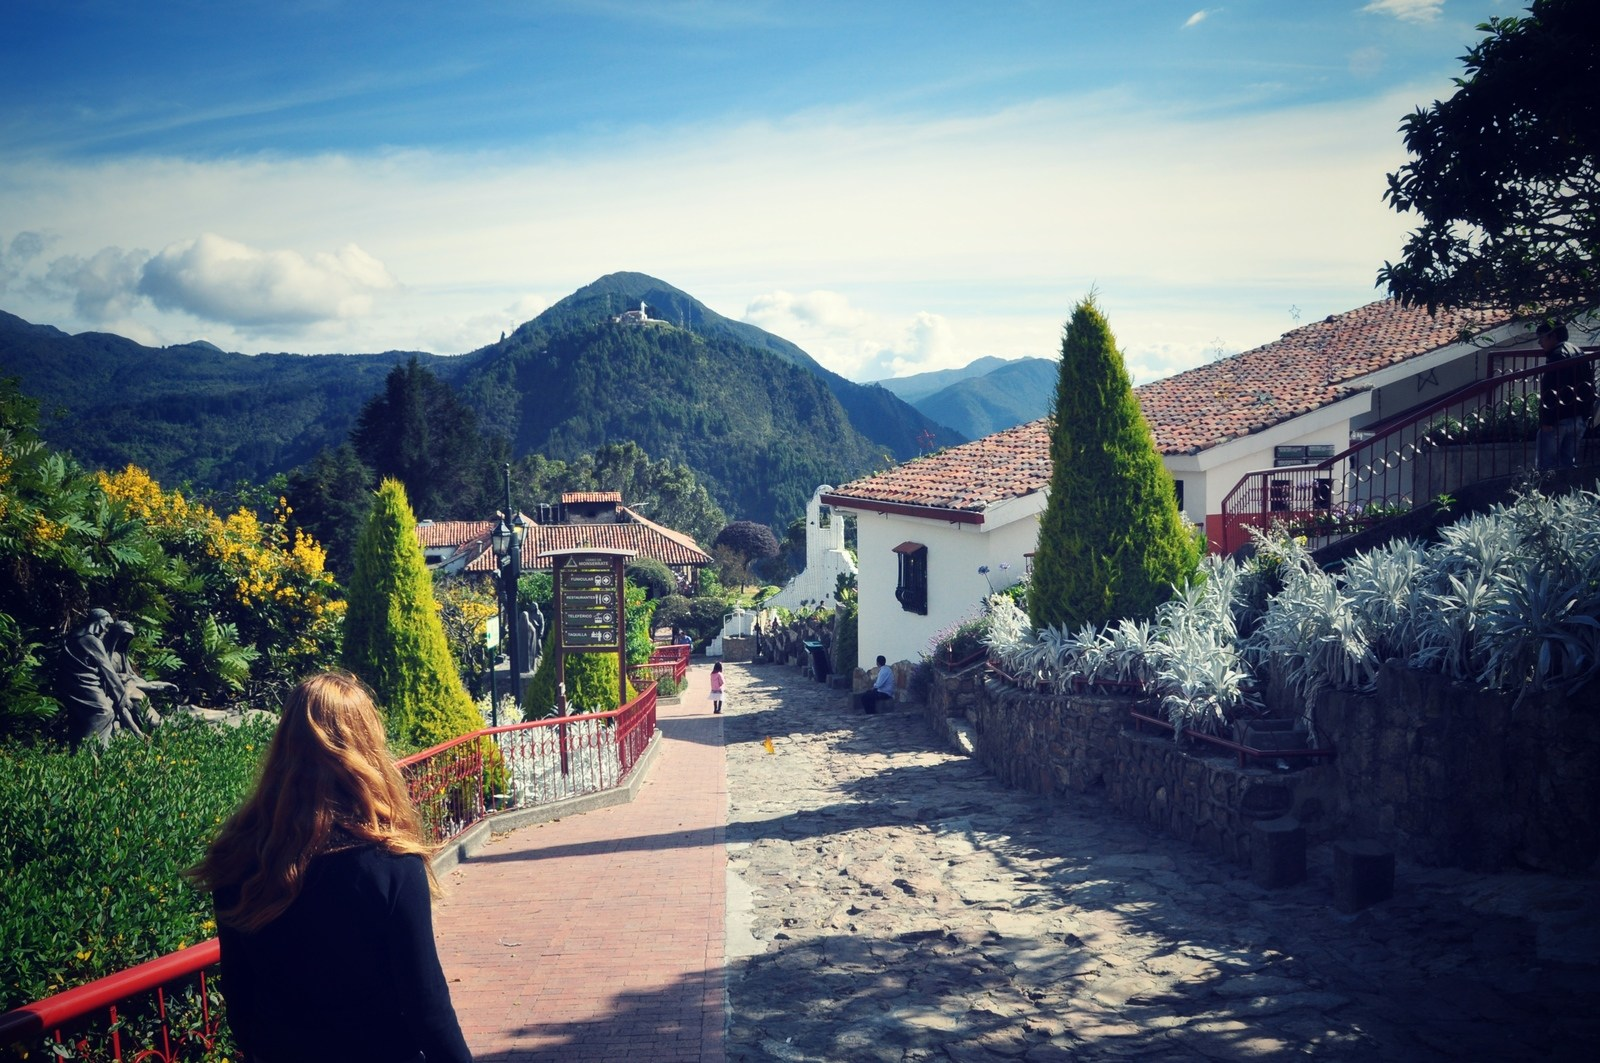 Monserrate, Colombie Cerro de Monserrate